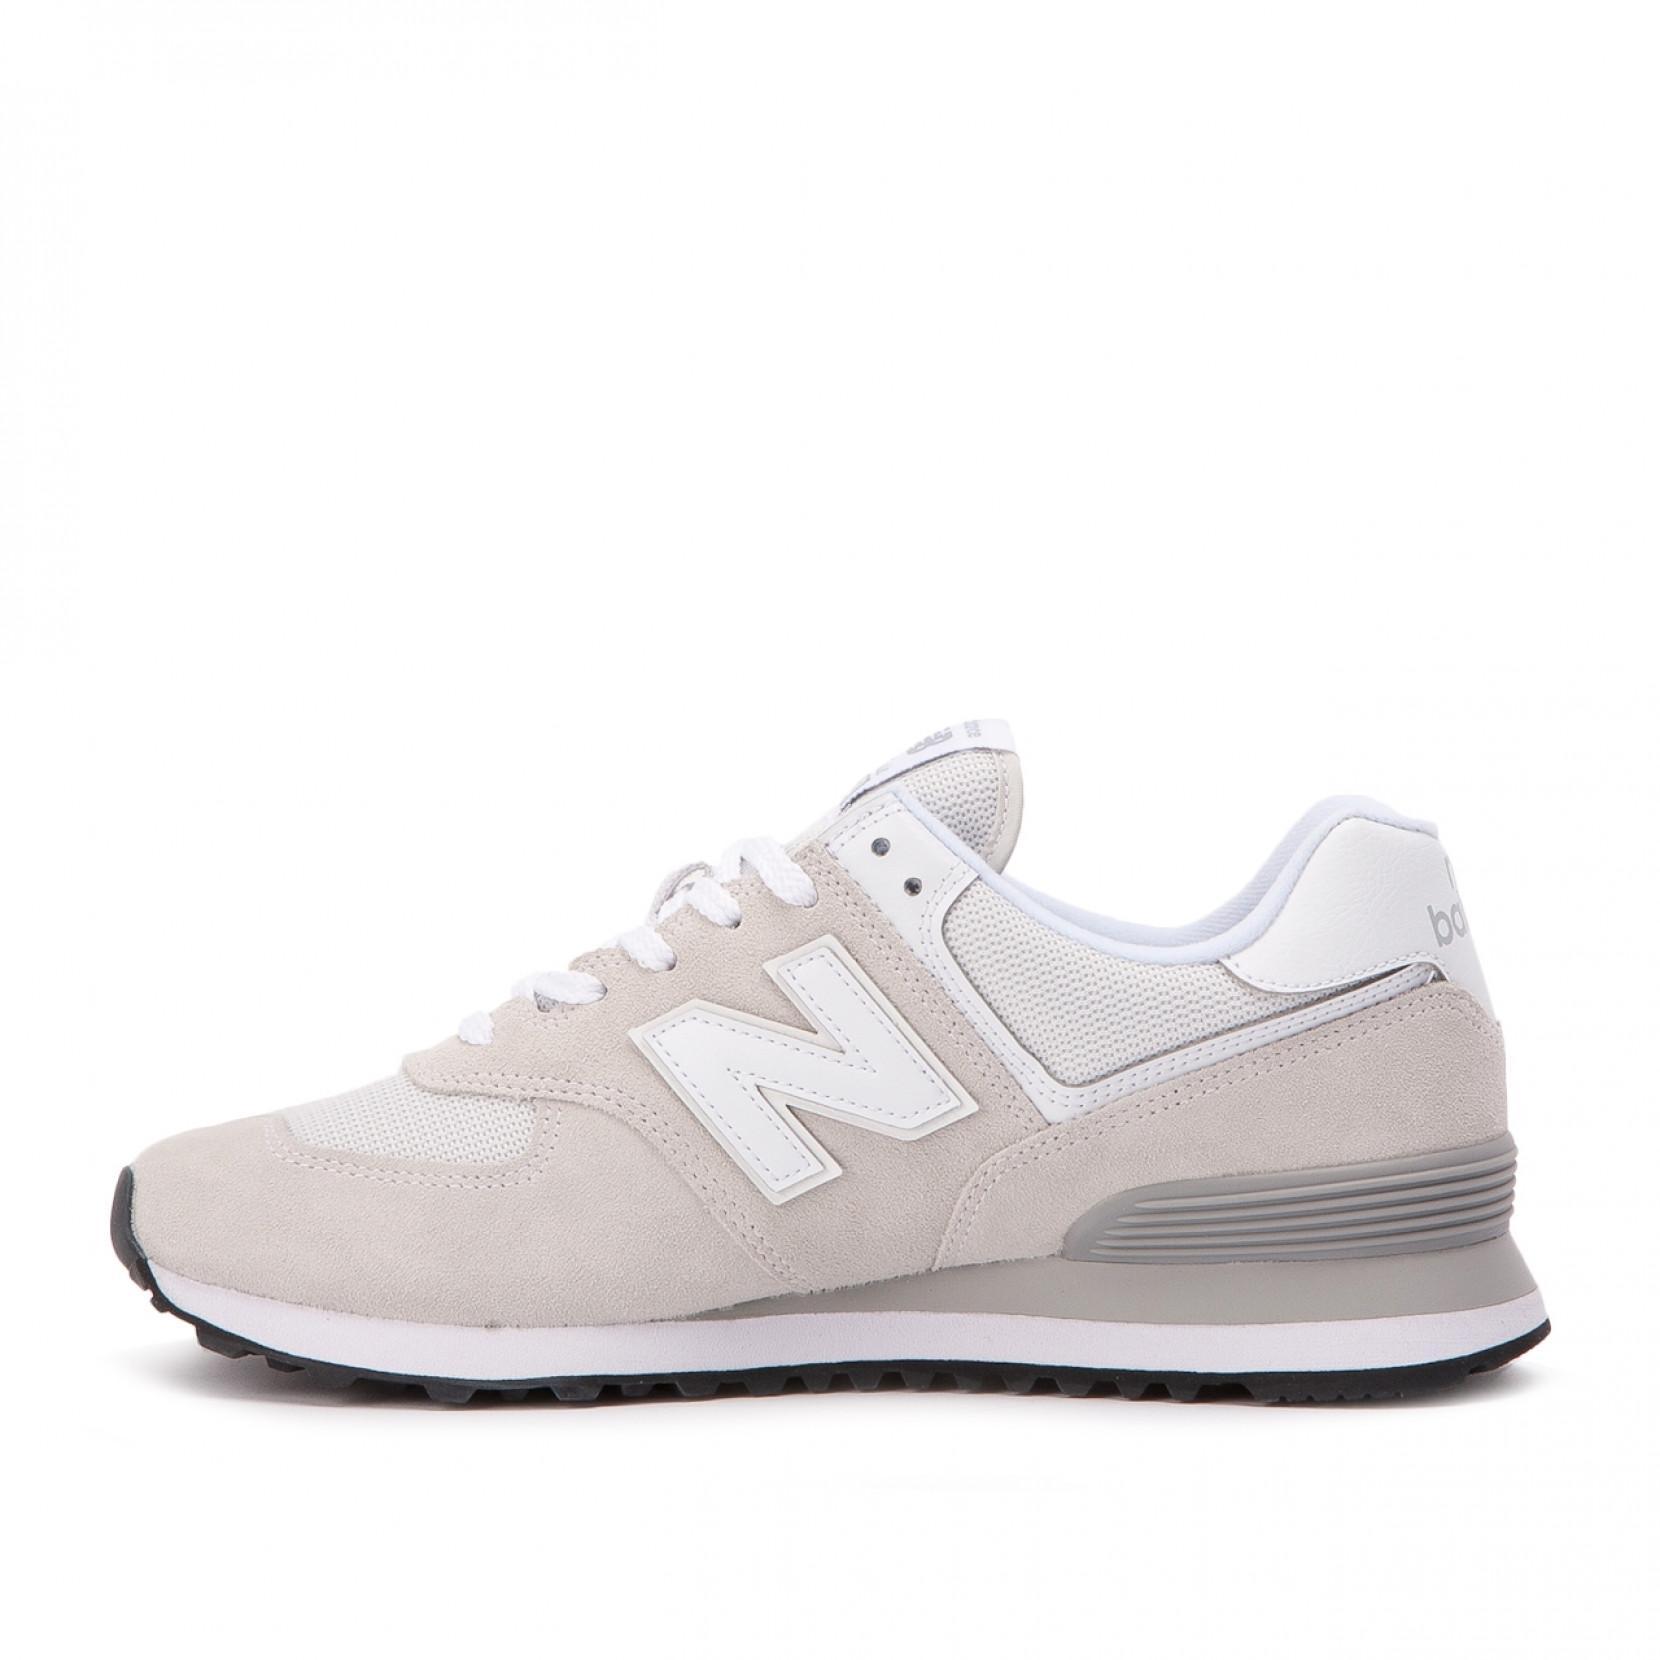 New Balance Ml 574 Egw in Grey (Gray